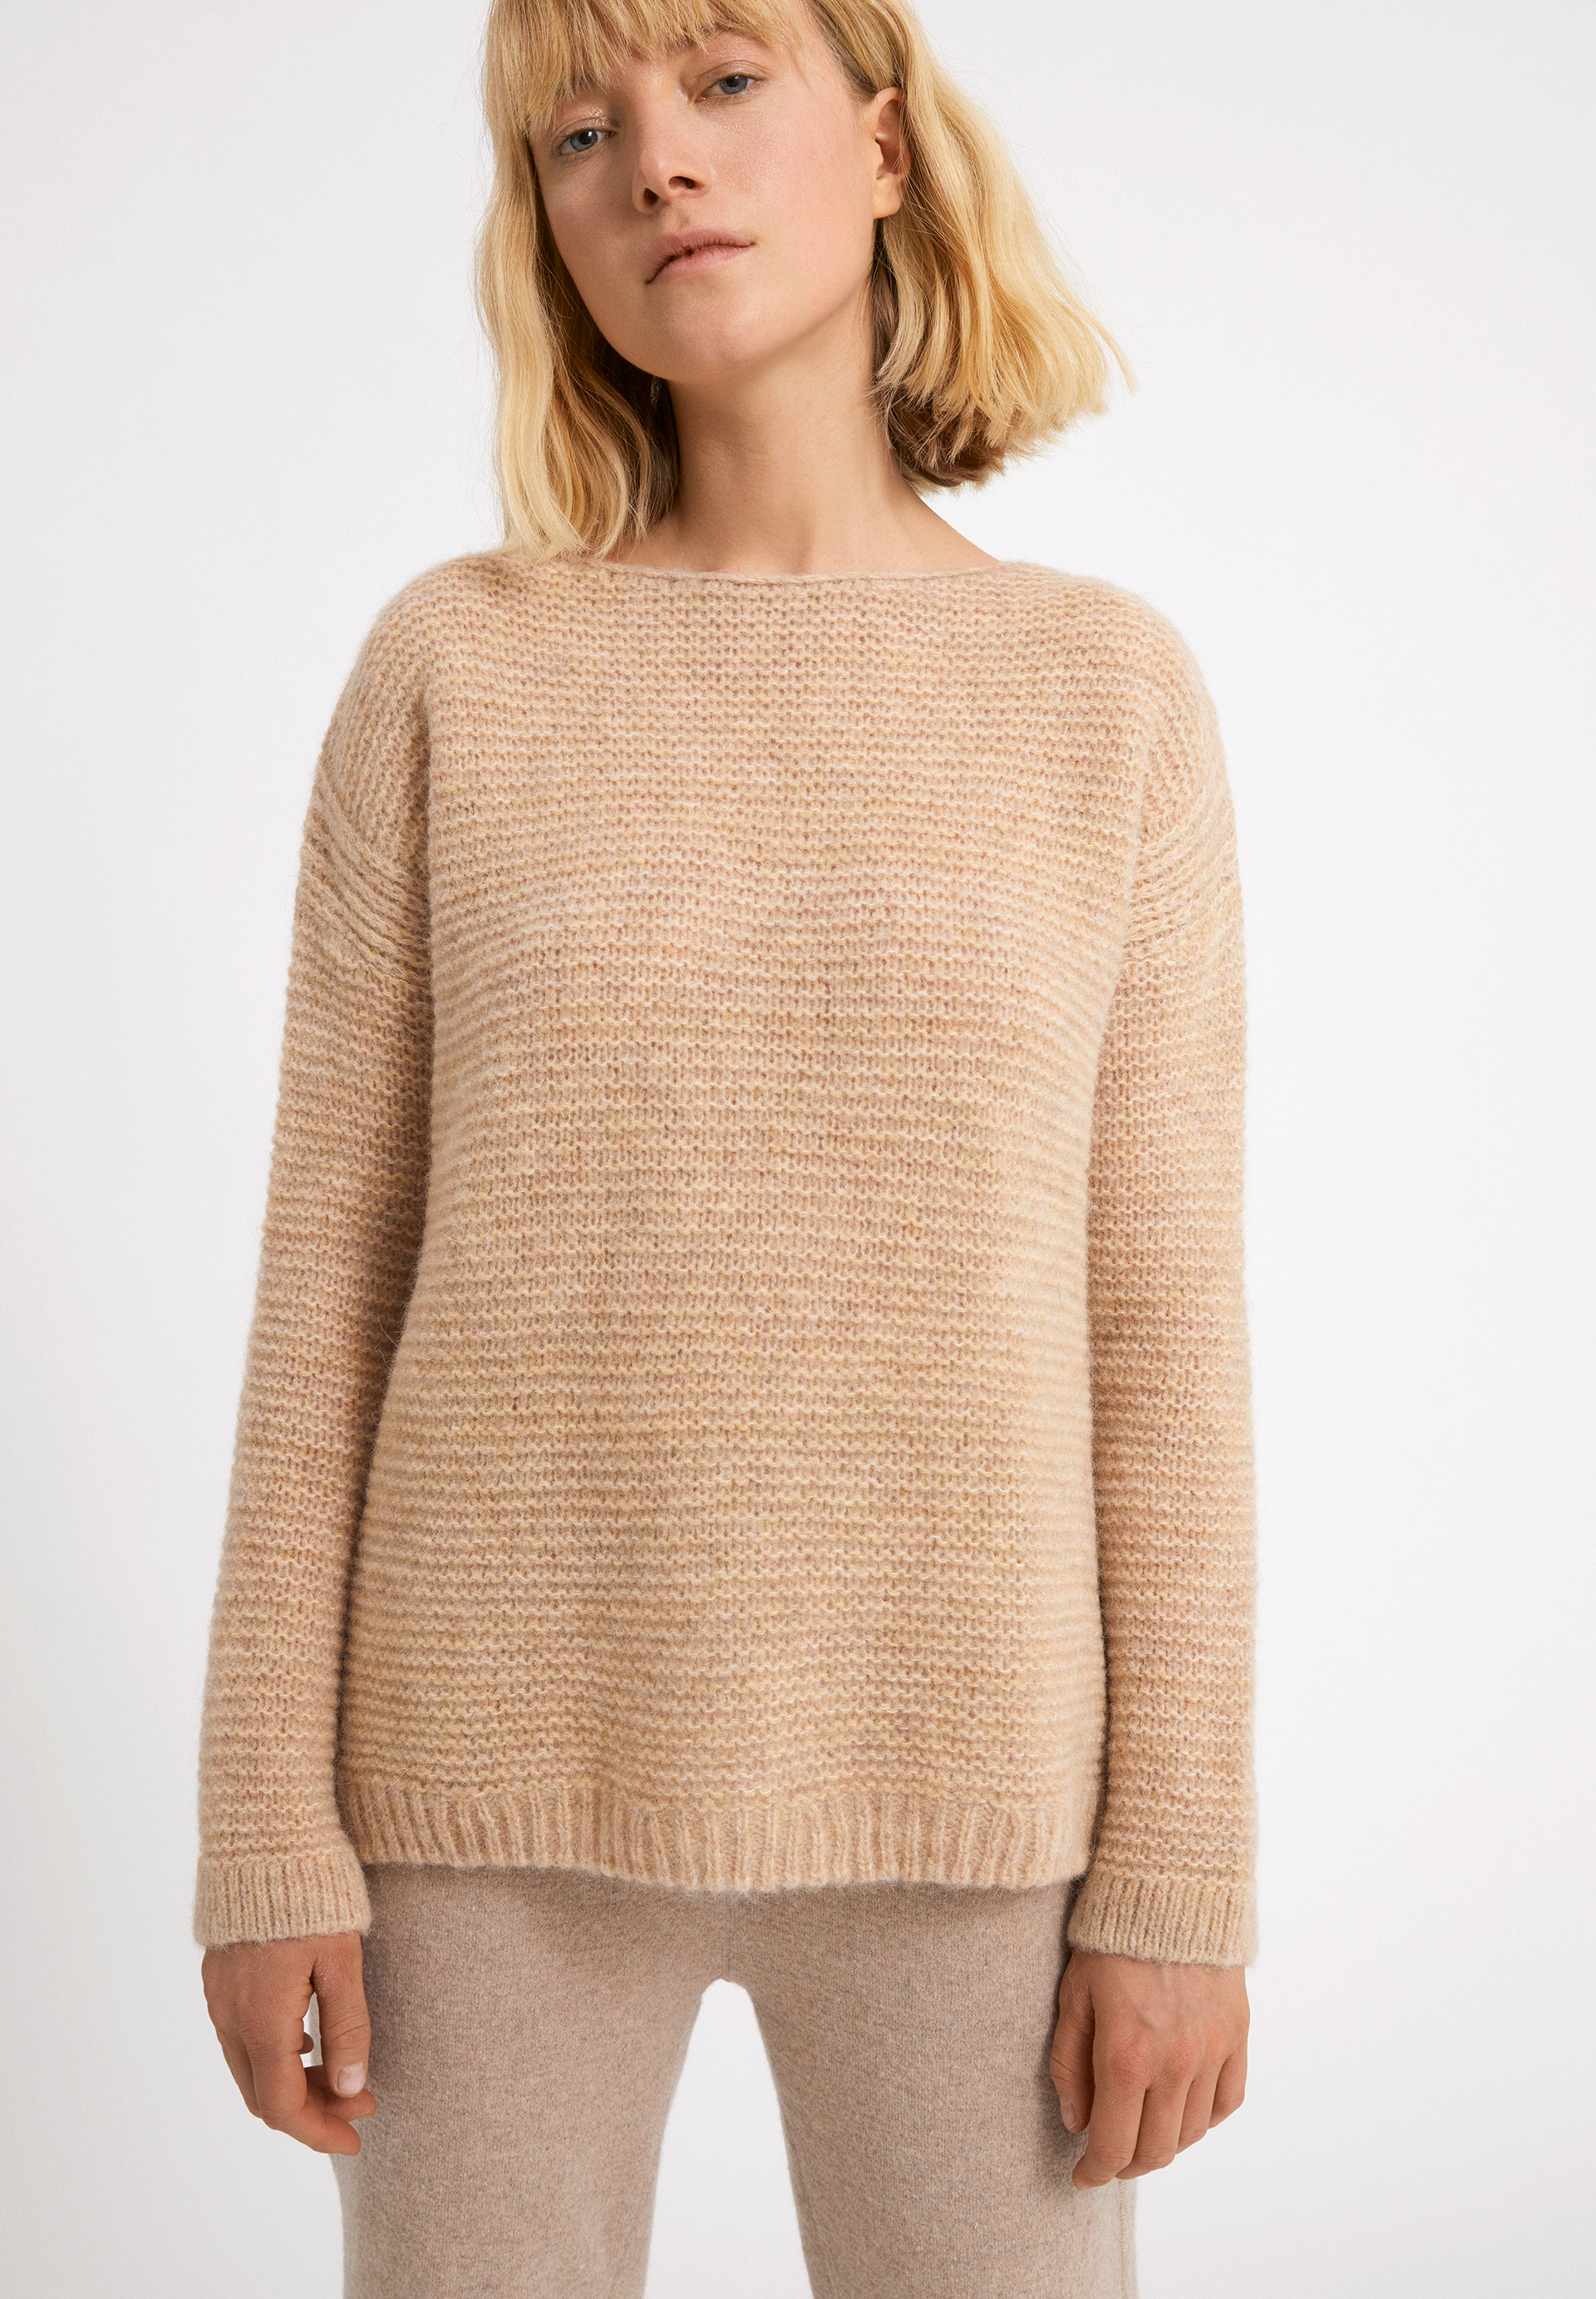 AGLAIAA Sweater made of Alpaca Wool Mix